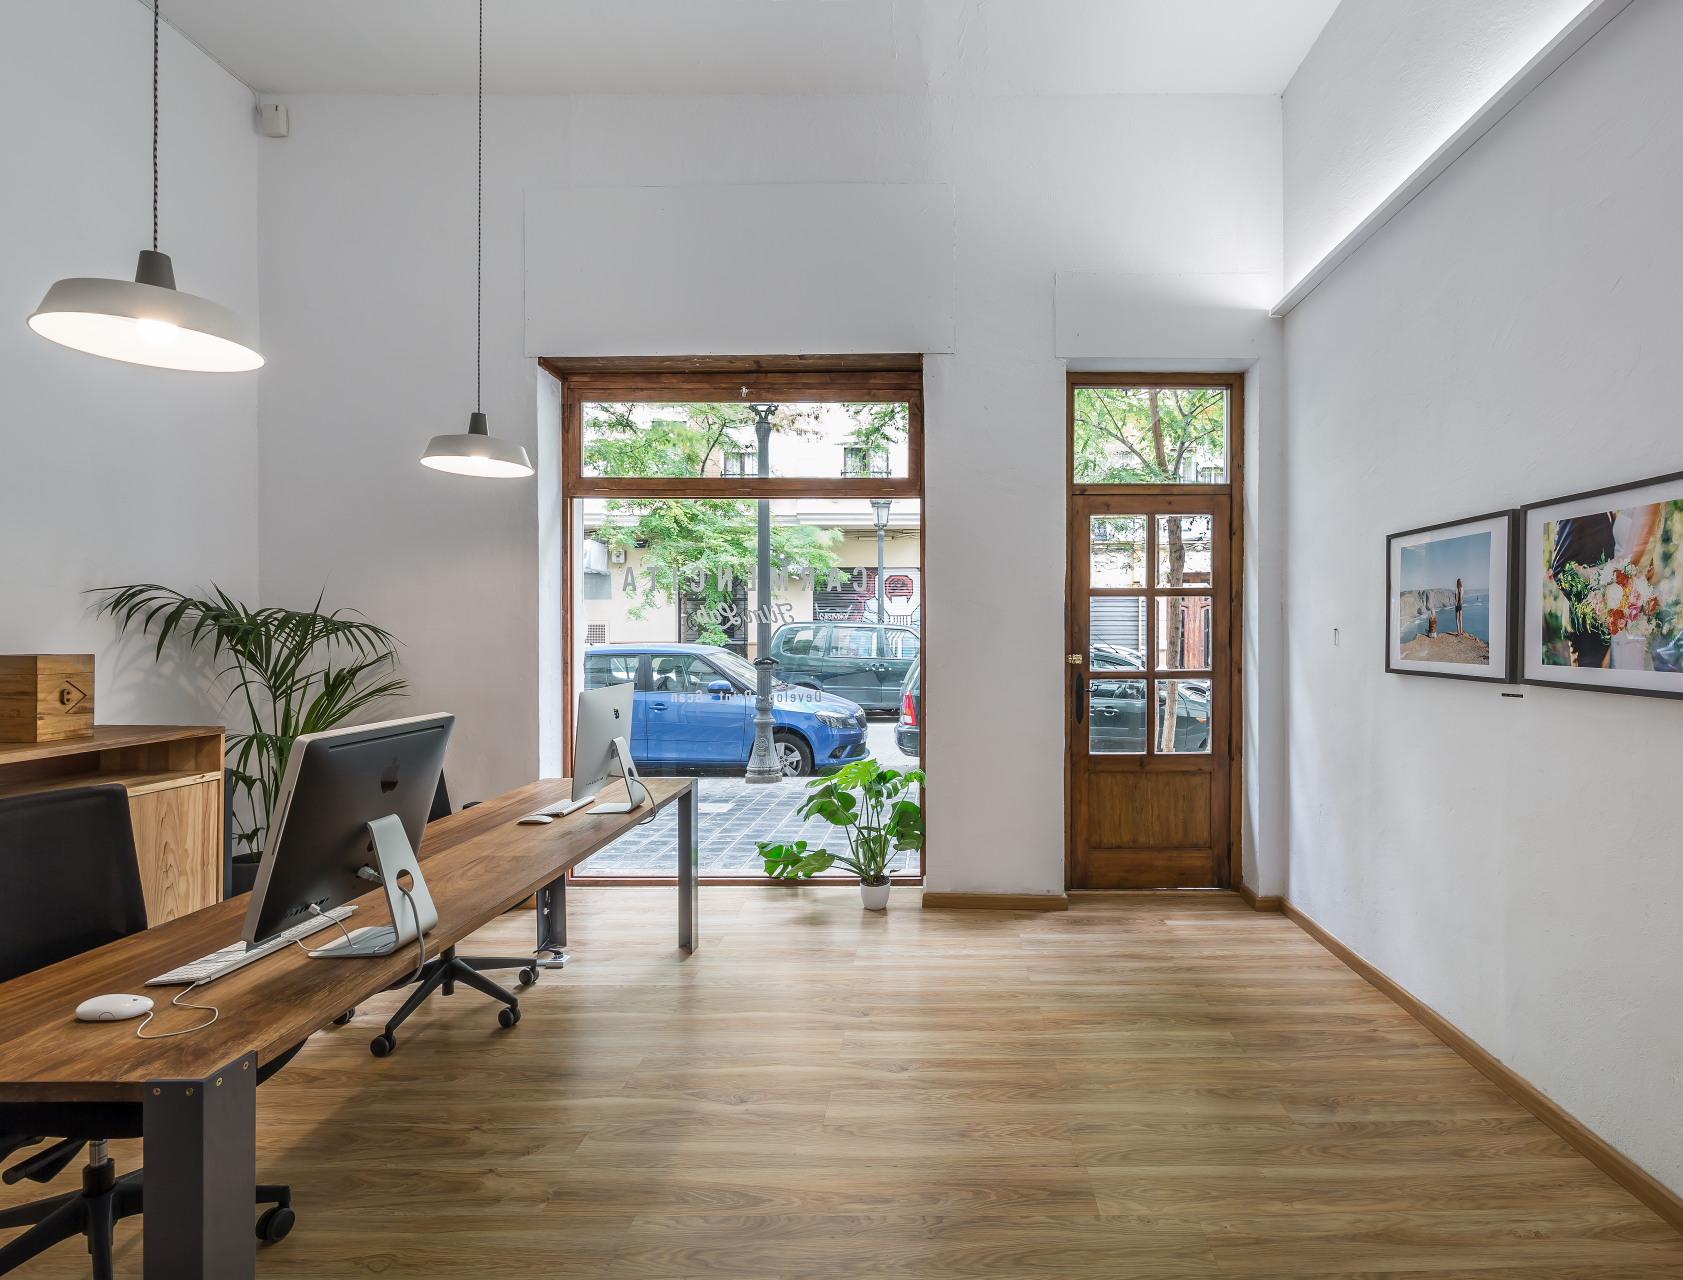 fotografia-arquitectura-interiorismo-valencia-german-cabo-boubau-carmencita-carmencitafilmlab (9)